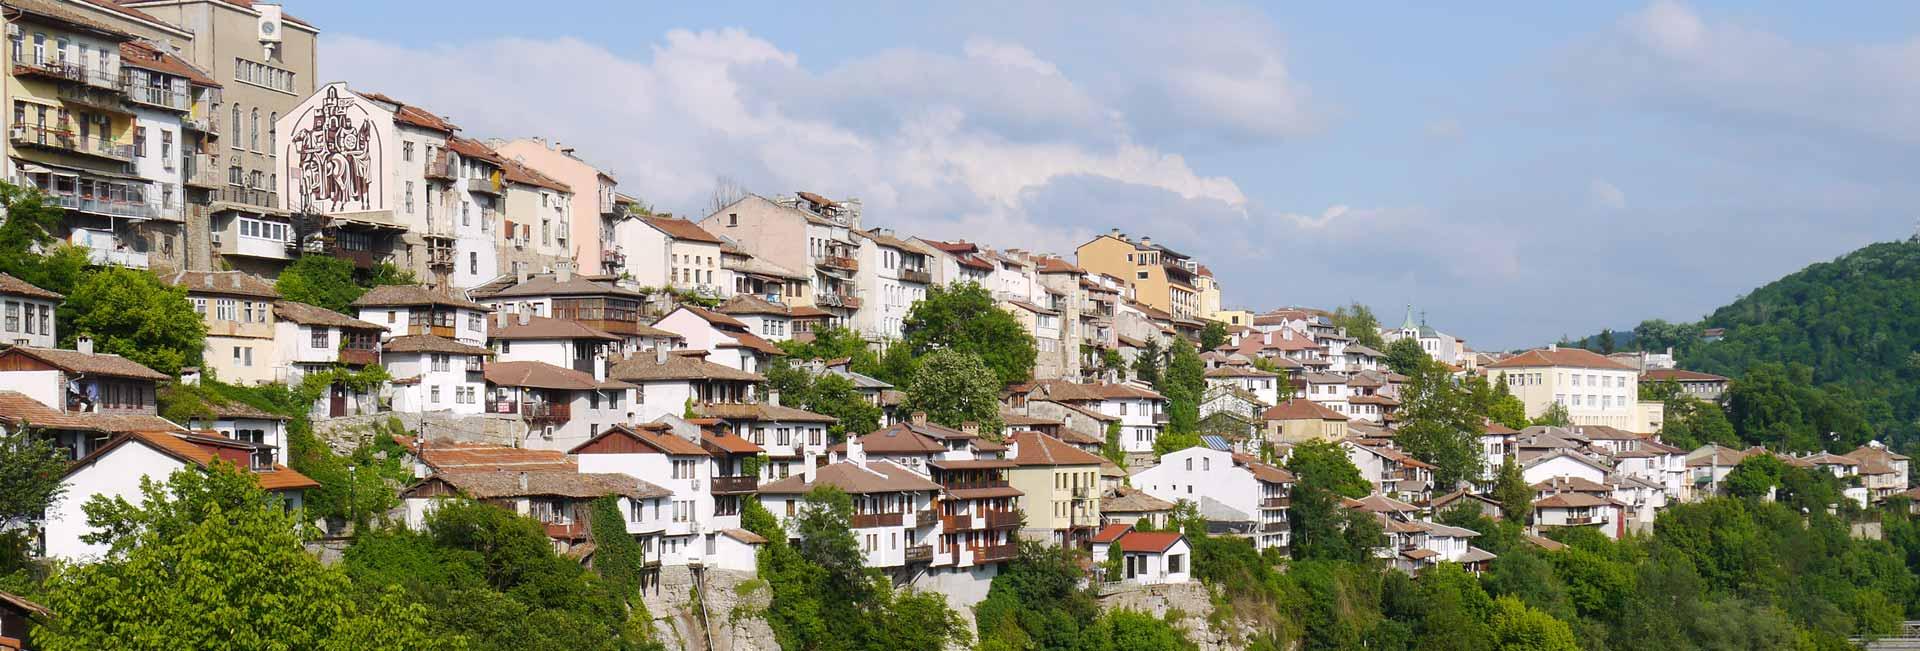 Veliko Tarnovo, Bulgaria. Photo credit: Martin Klimenta